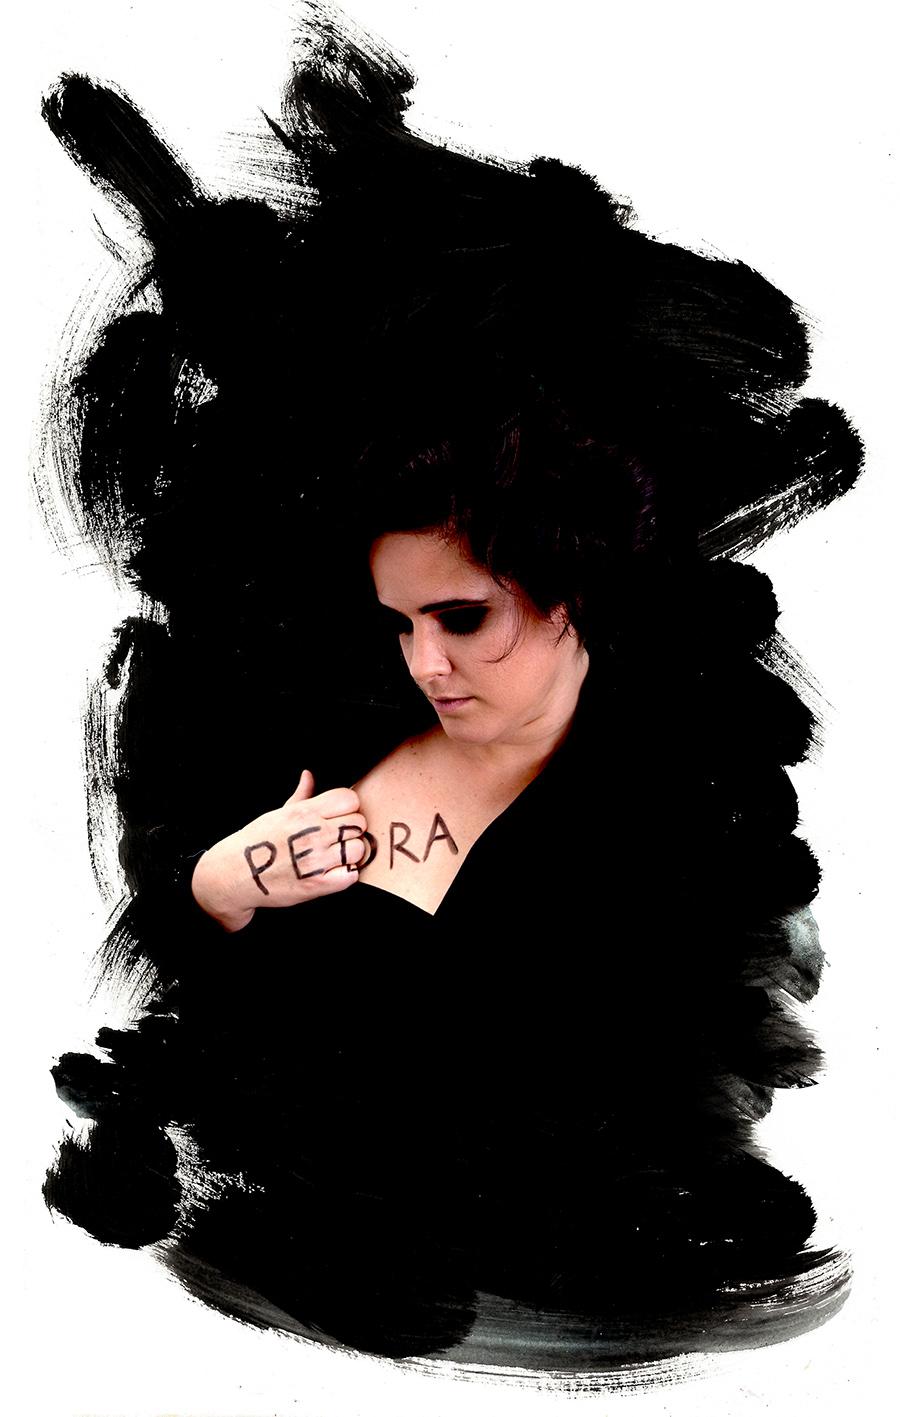 ALE PEDRA FOTO TIAGO LIMA ARTE VANA MEDEROS.jpg